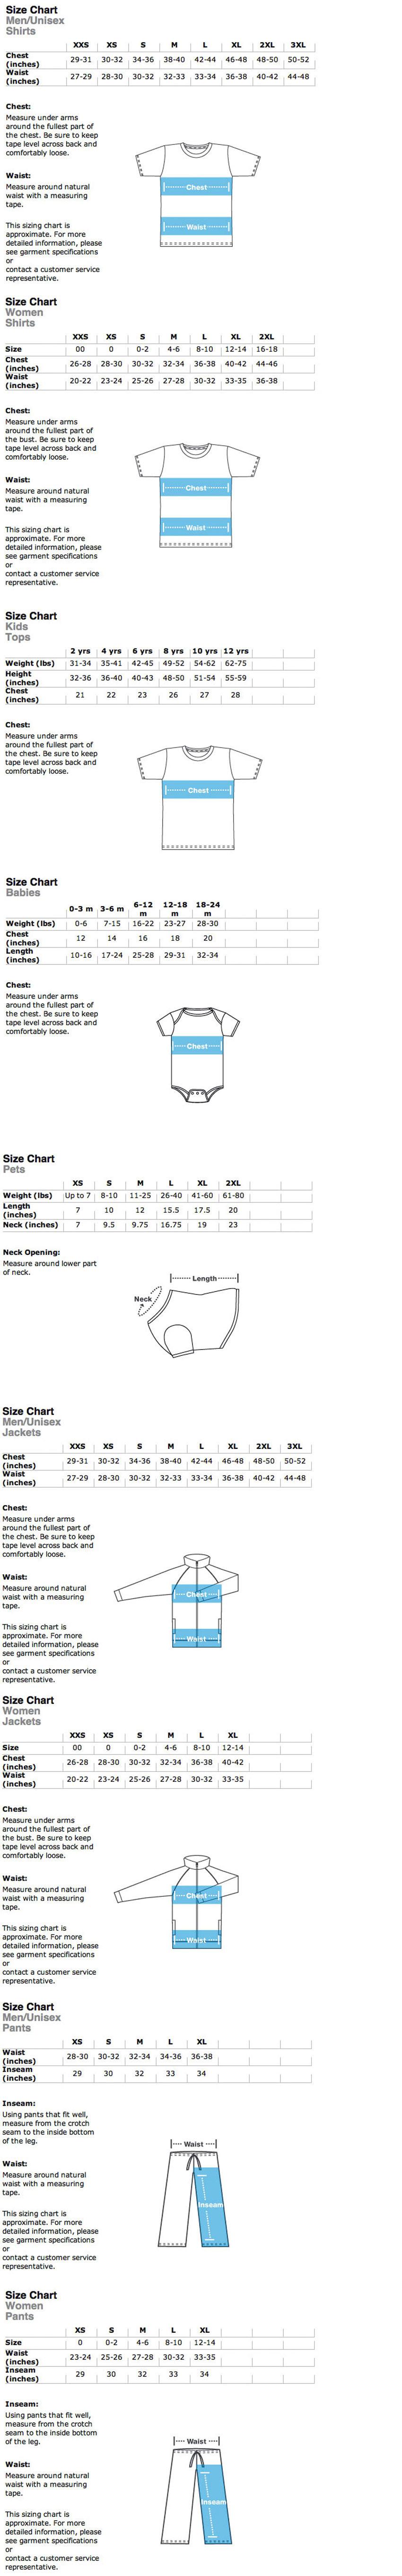 American Apparel Size Chart